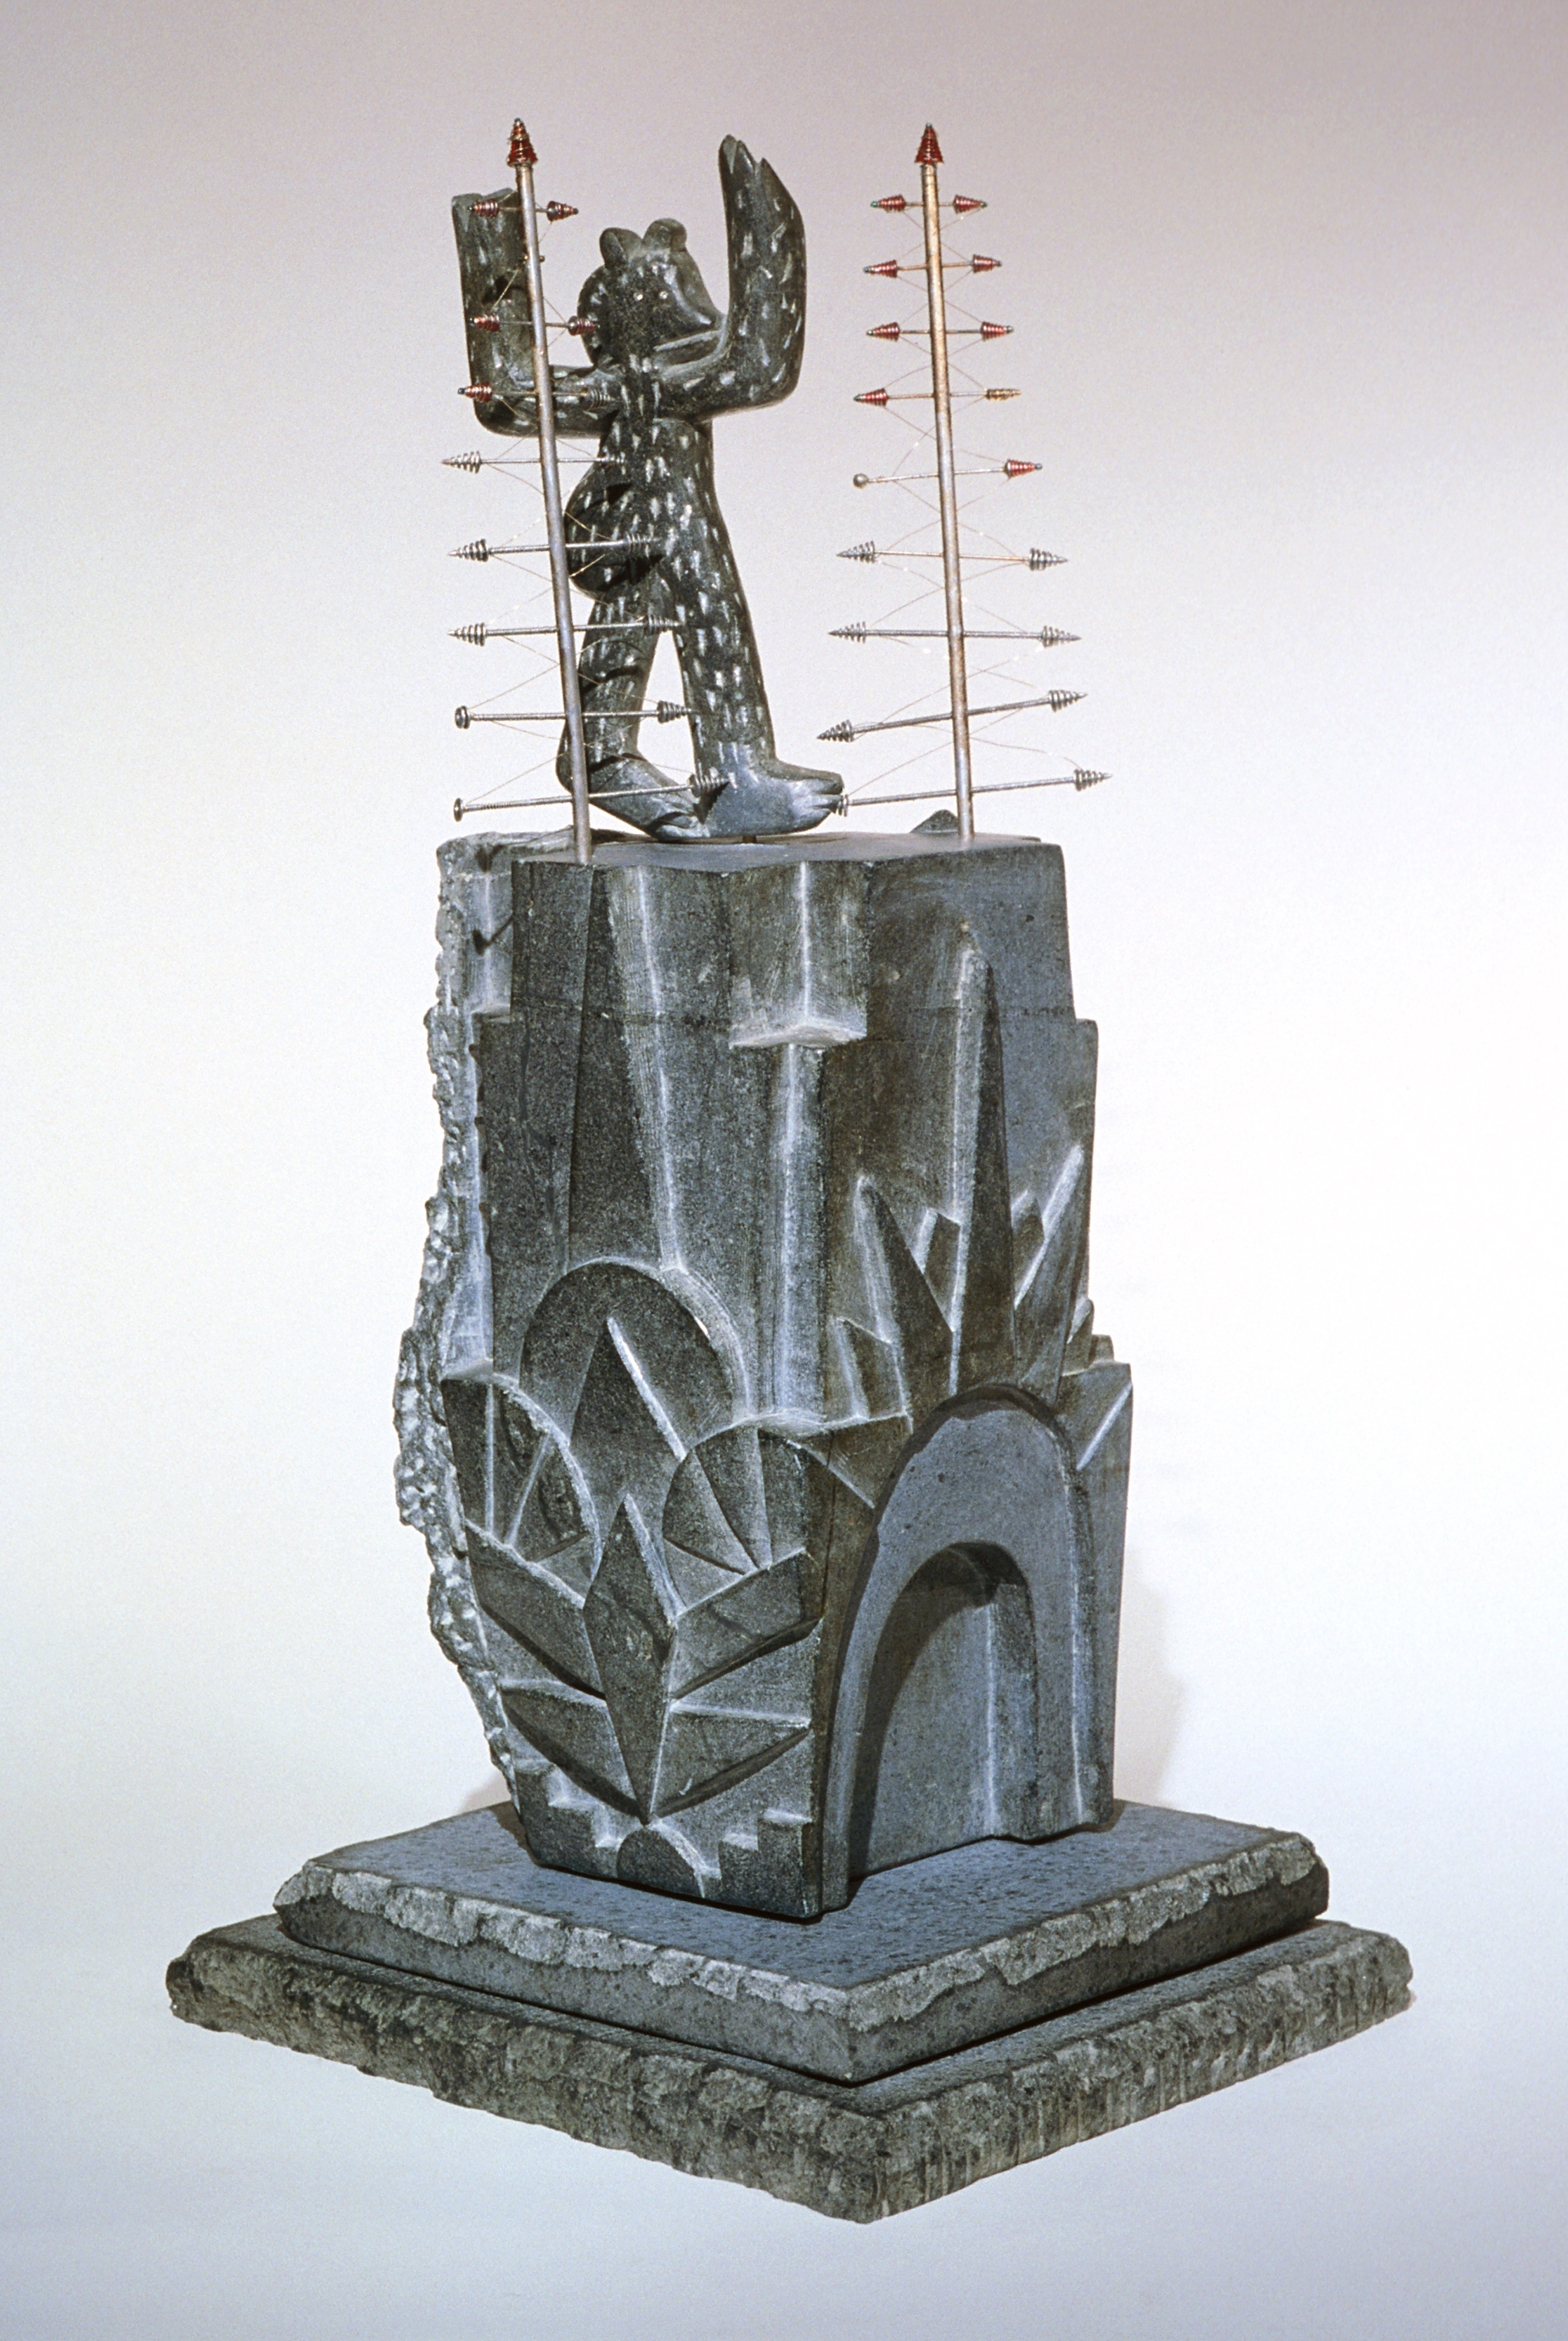 King Kong takes the Chrysler Building